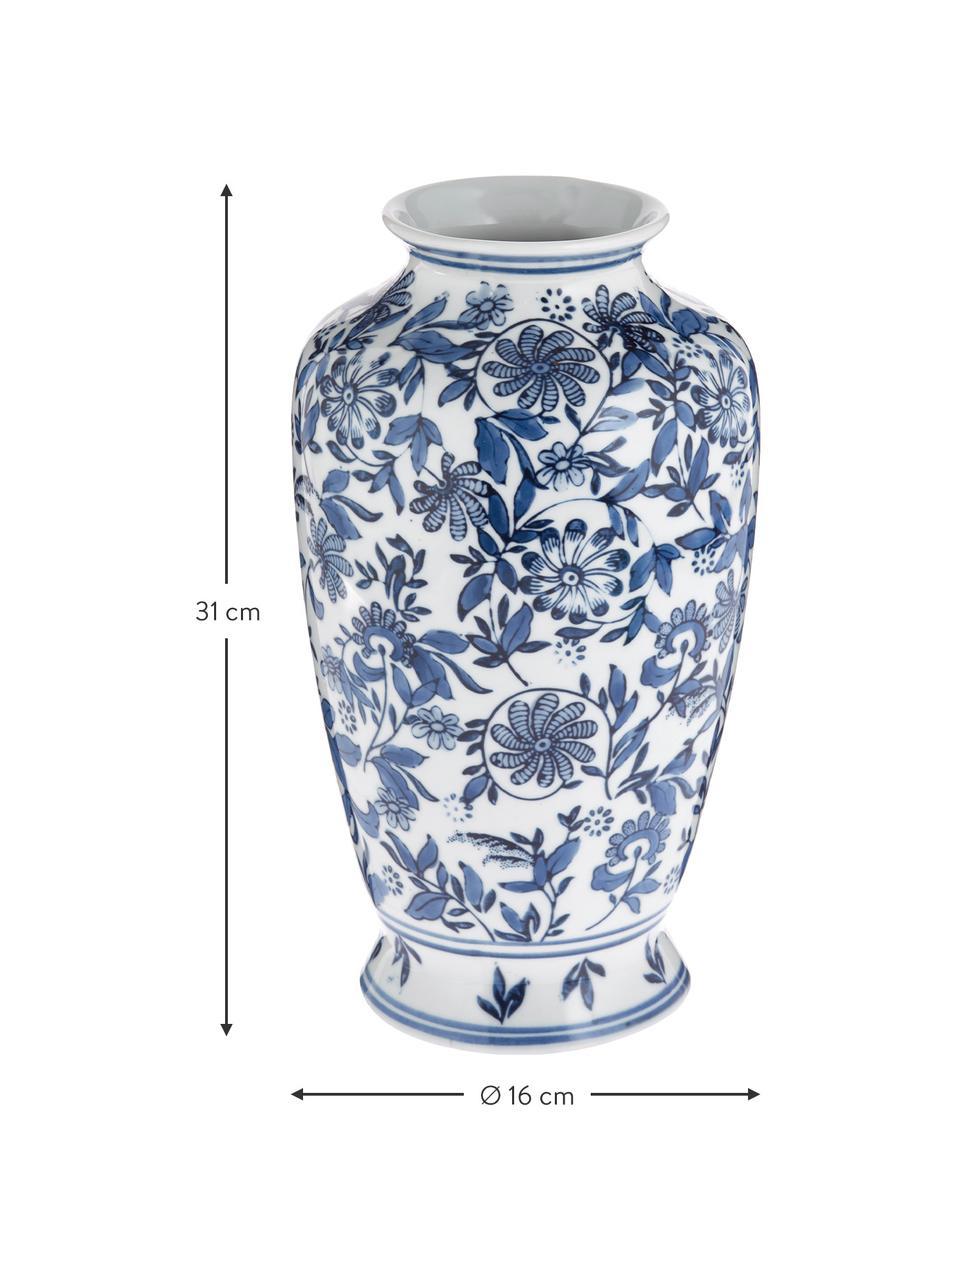 Grote decoratieve vaas Lin van porselein, Porselein, niet waterdicht, Blauw, wit, H 31 cm